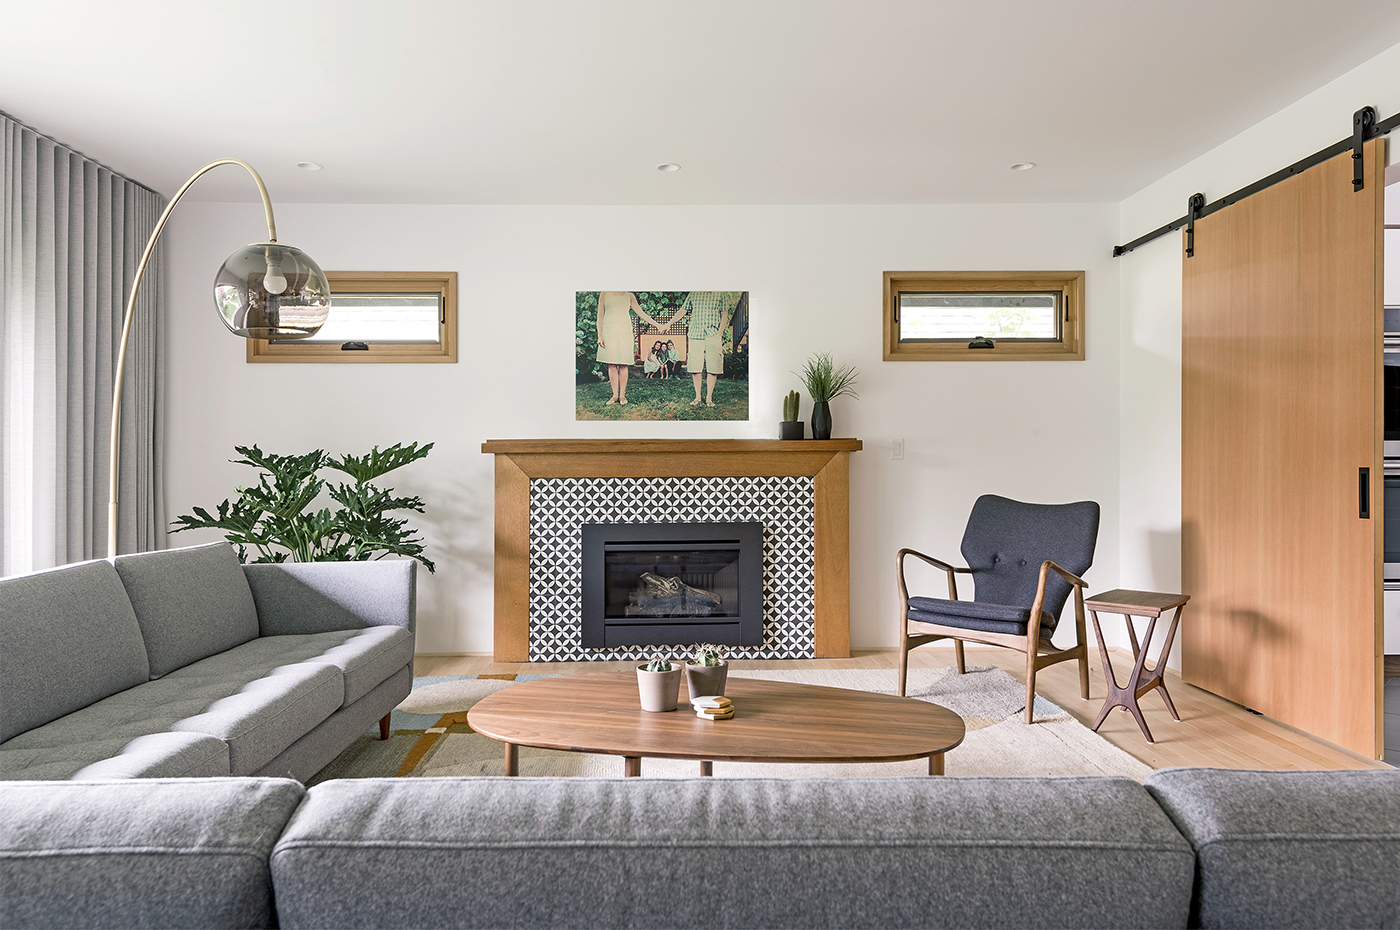 2) fireplace